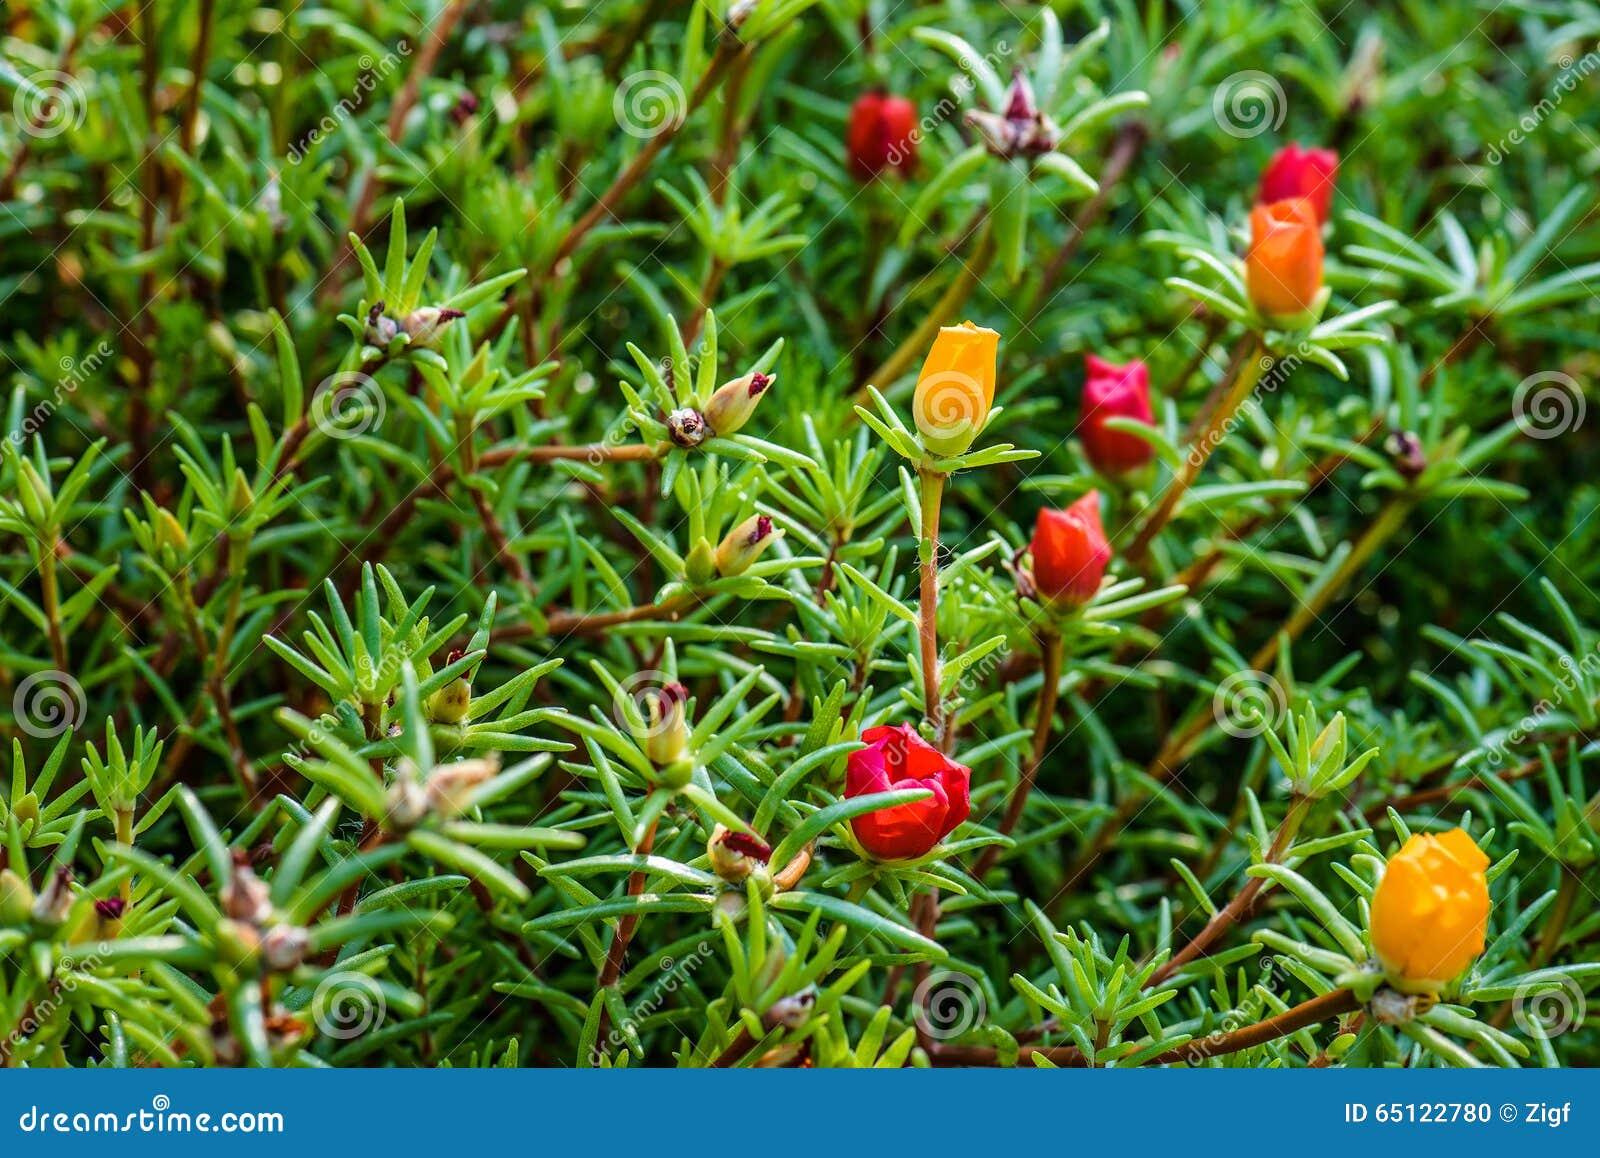 Portulaca Grandiflora Is Plant In Portulacaceae Stock ...